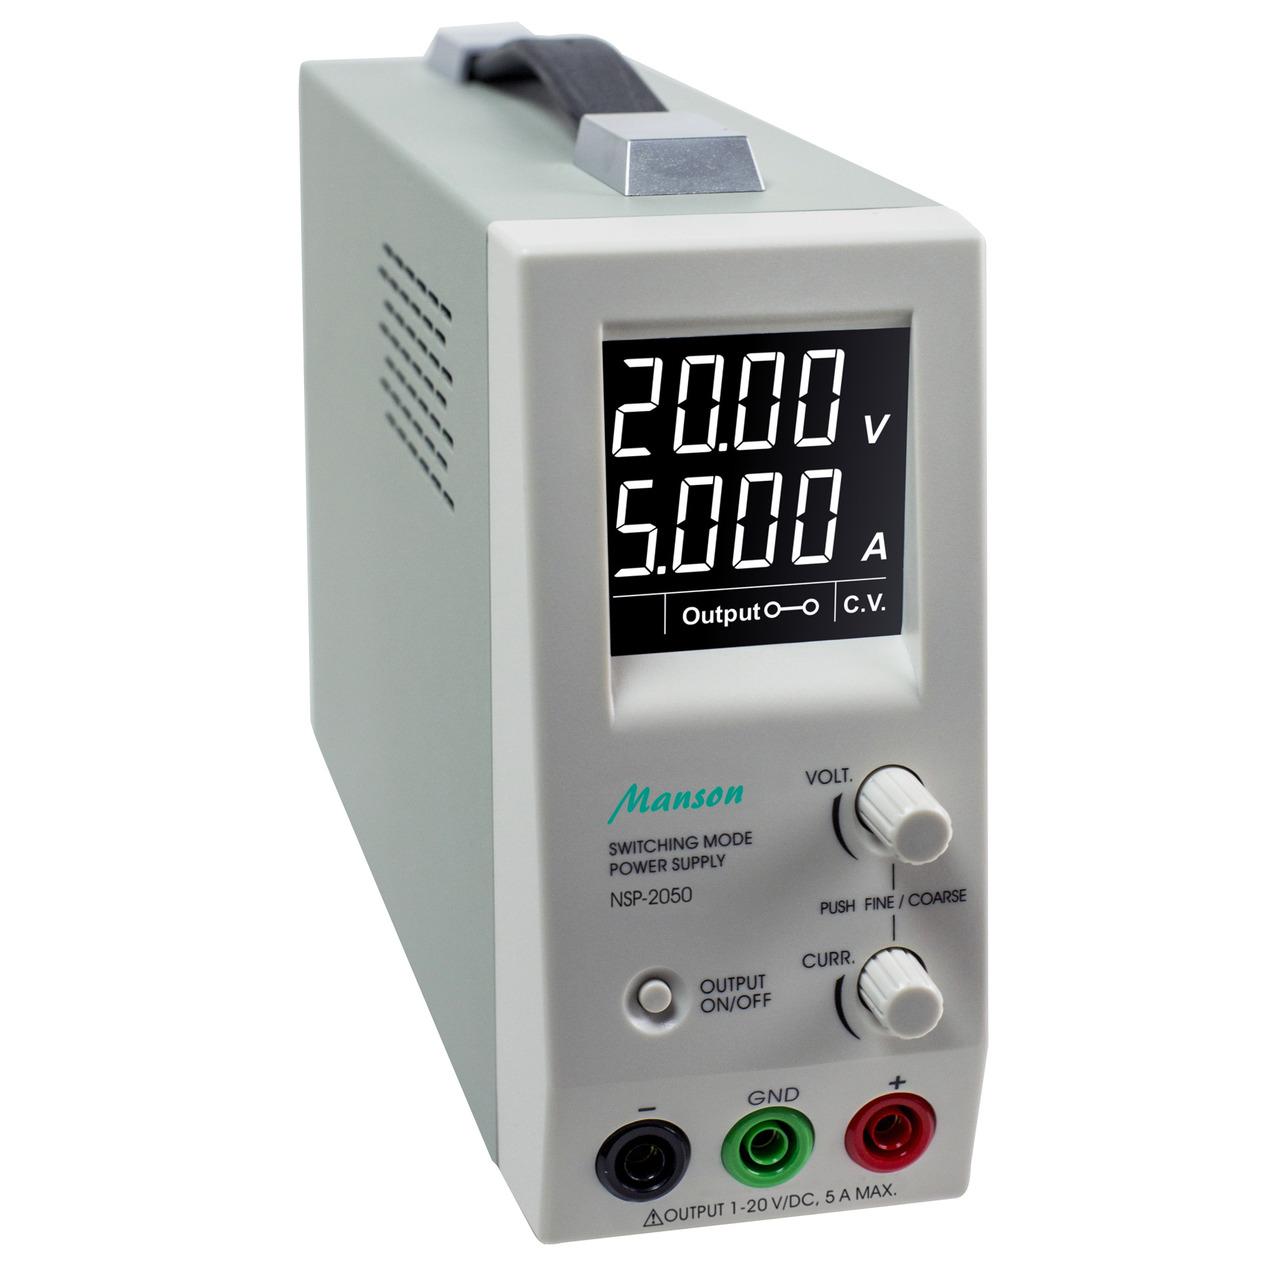 Manson Schaltnetzgerät NSP-2050- 1-20V- 0-5A